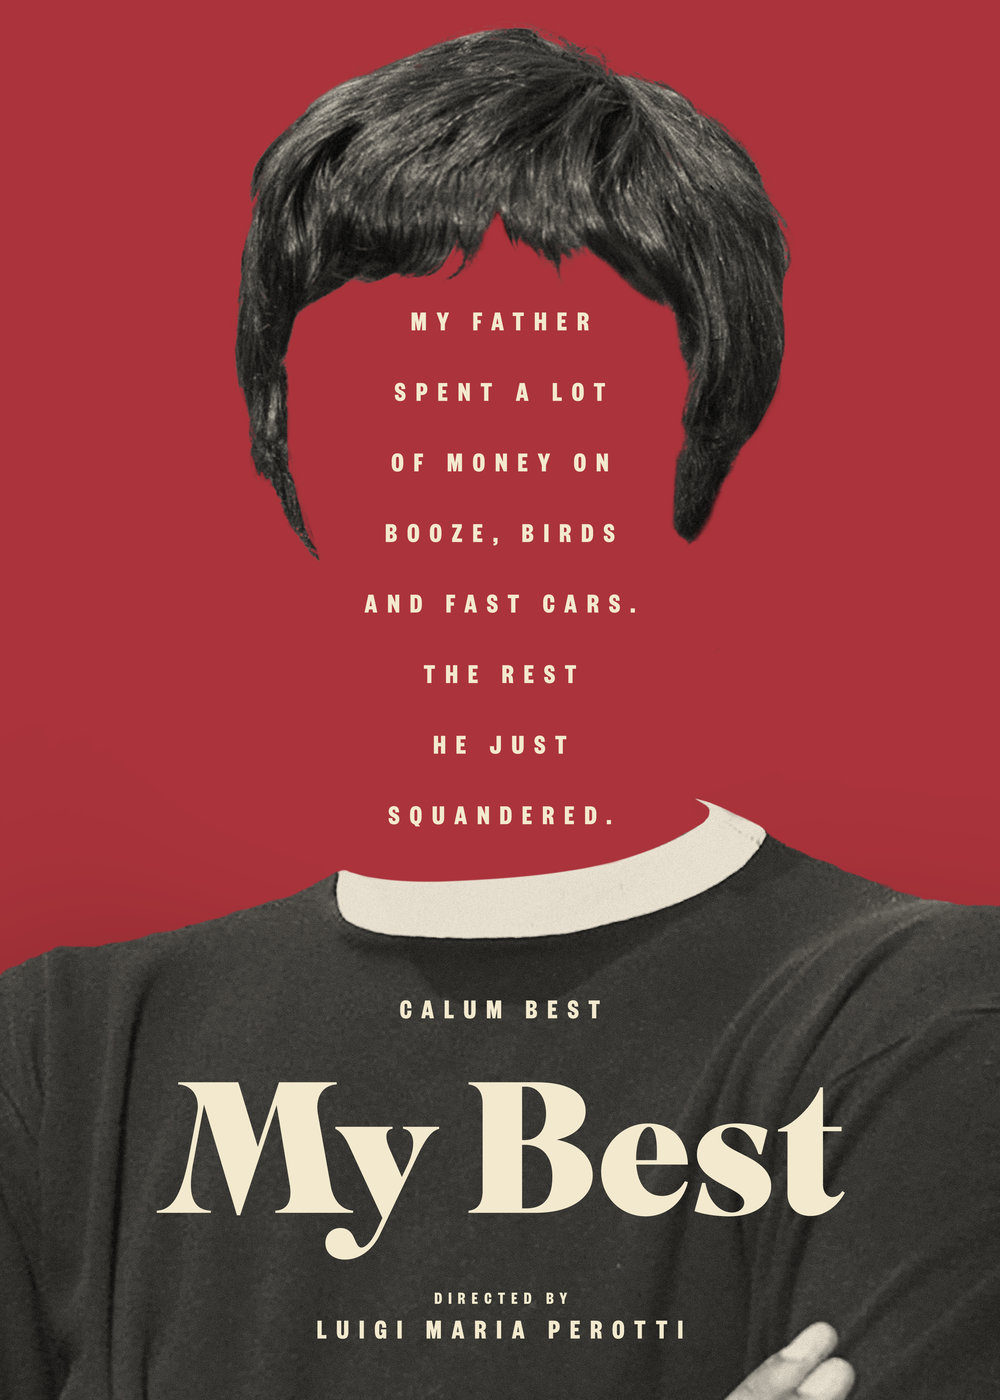 'My Best' film